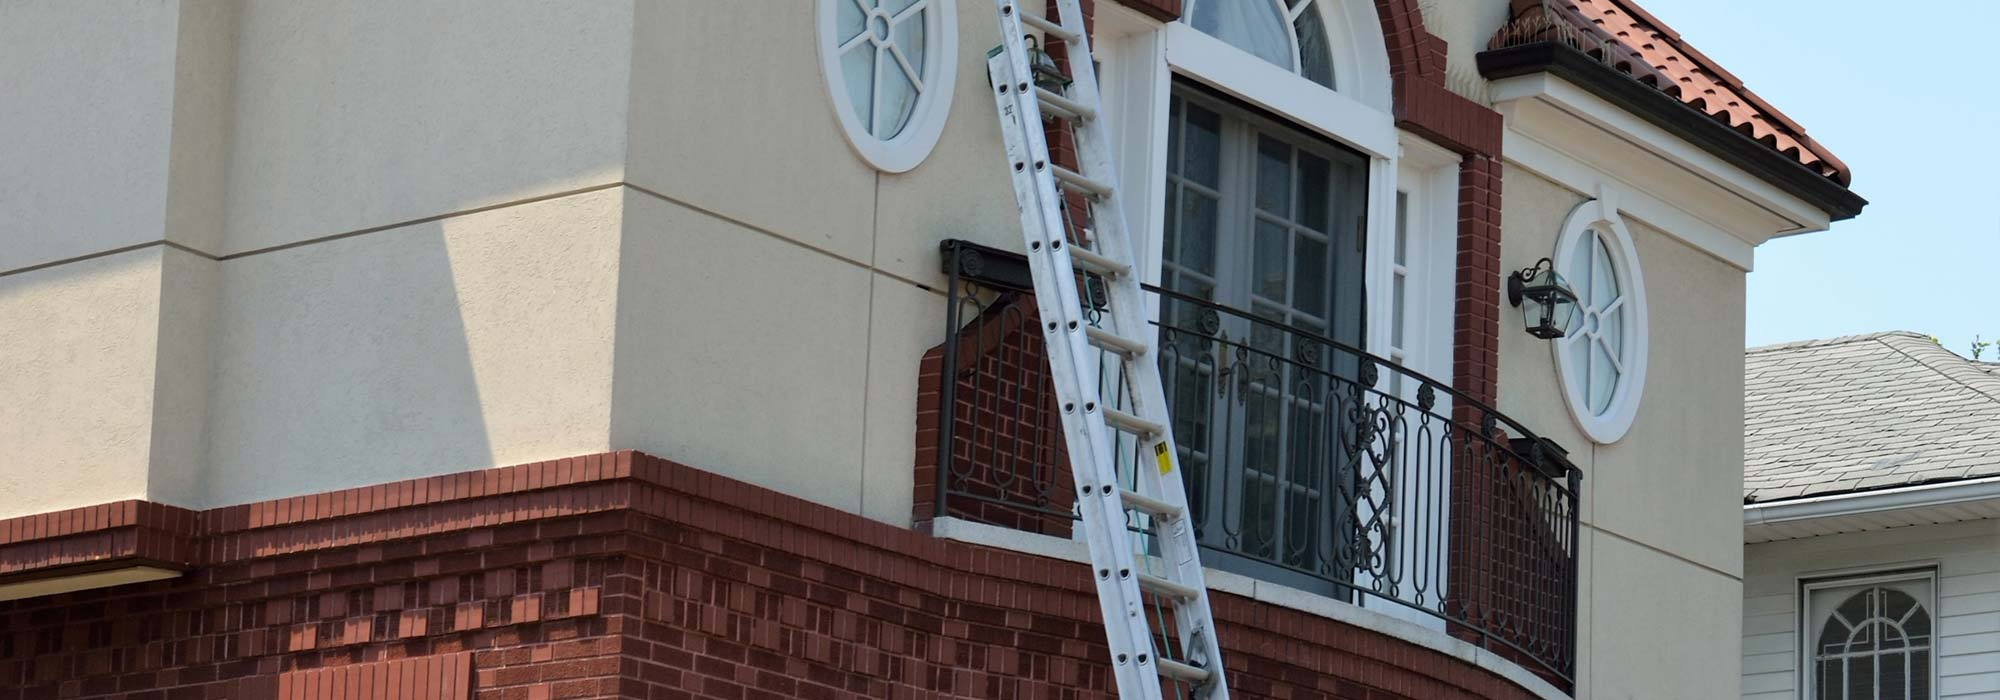 replace windows